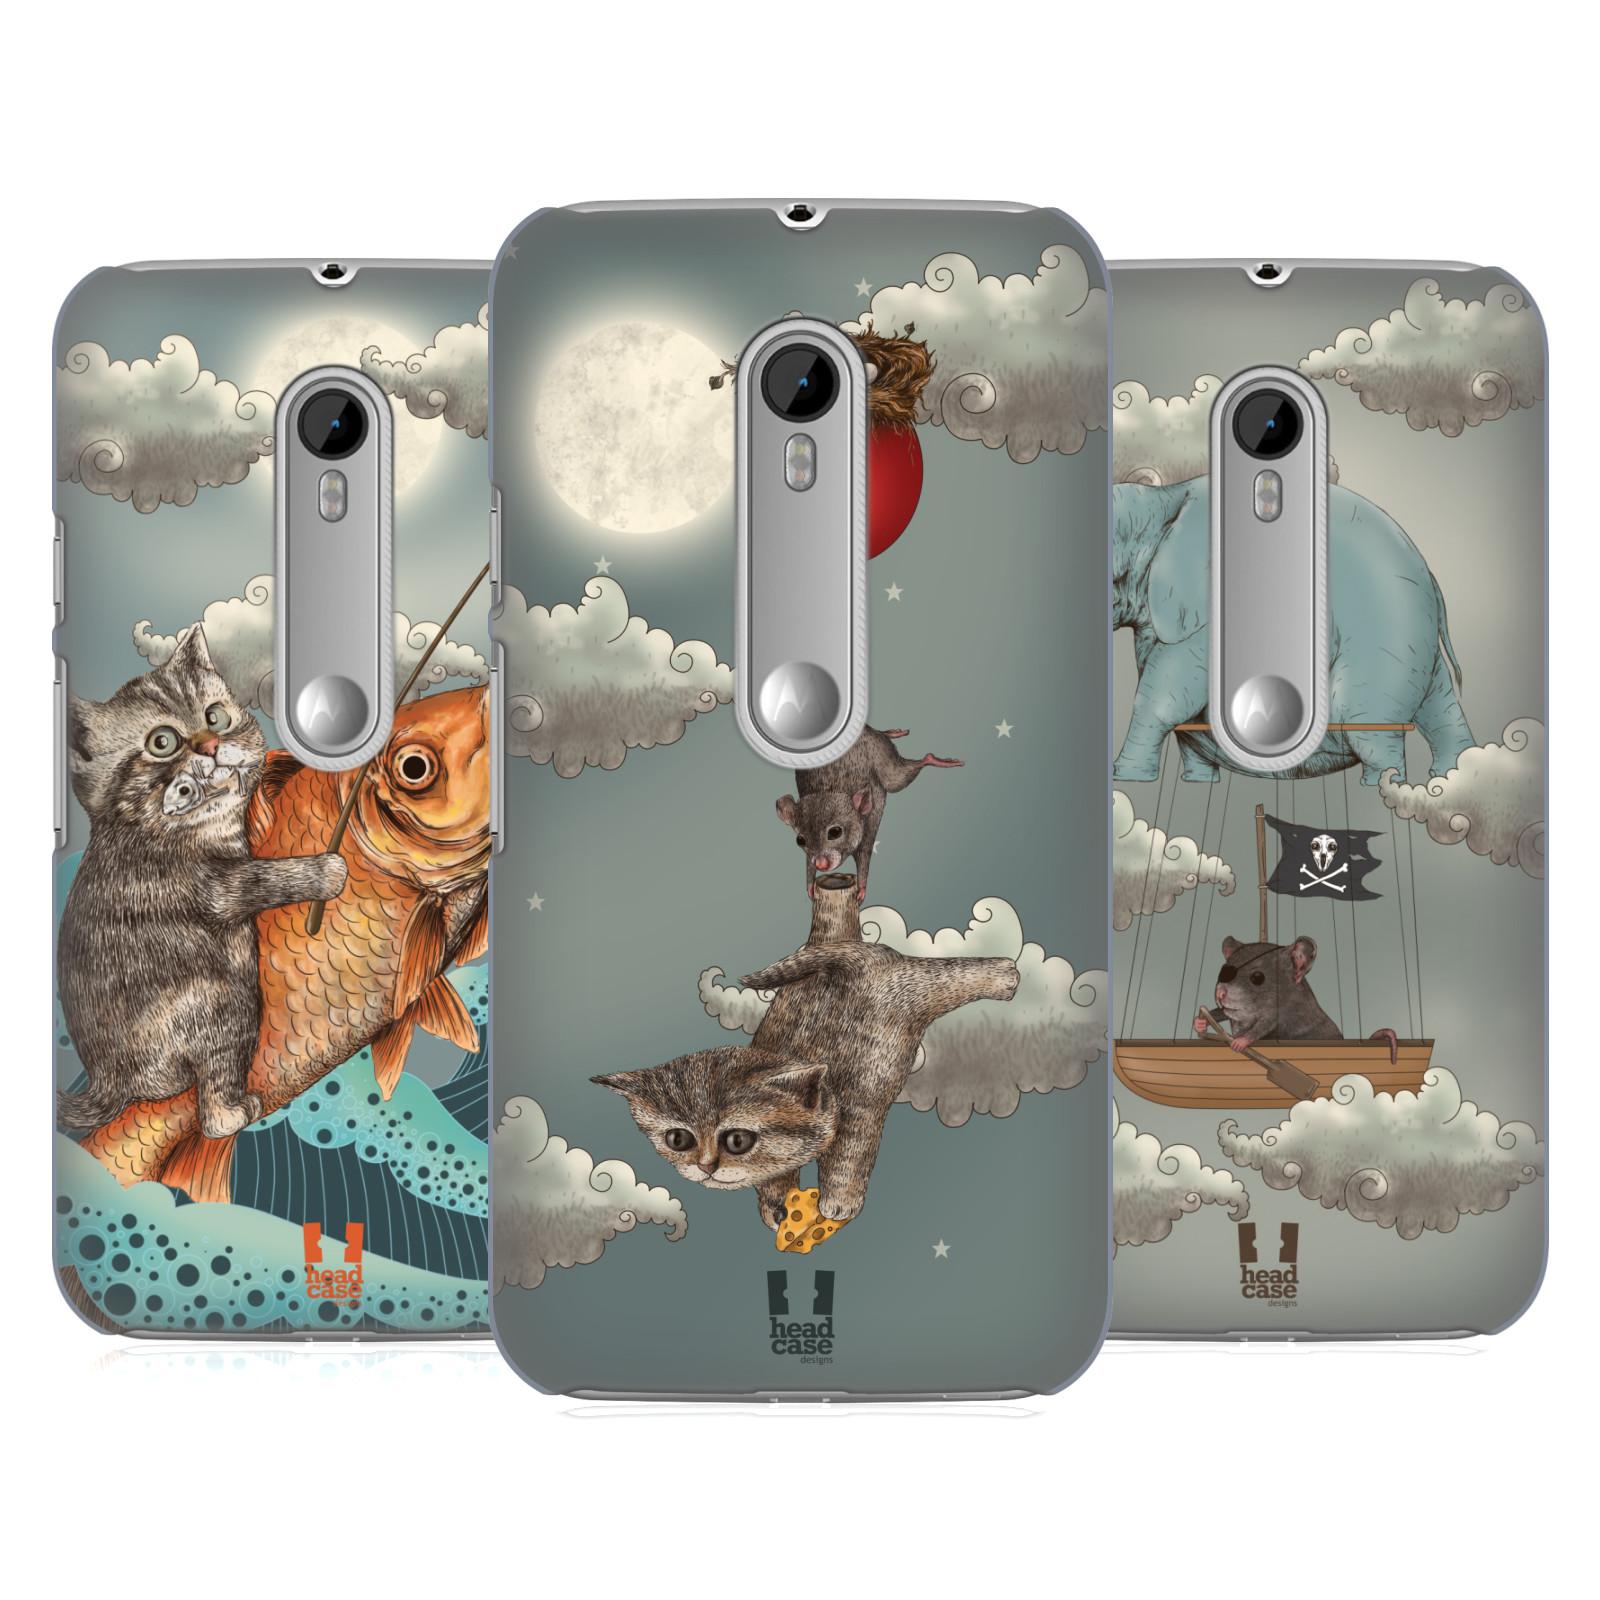 HEAD-CASE-DESIGNS-ANIMAL-FANTASIES-HARD-BACK-CASE-FOR-MOTOROLA-PHONES-1